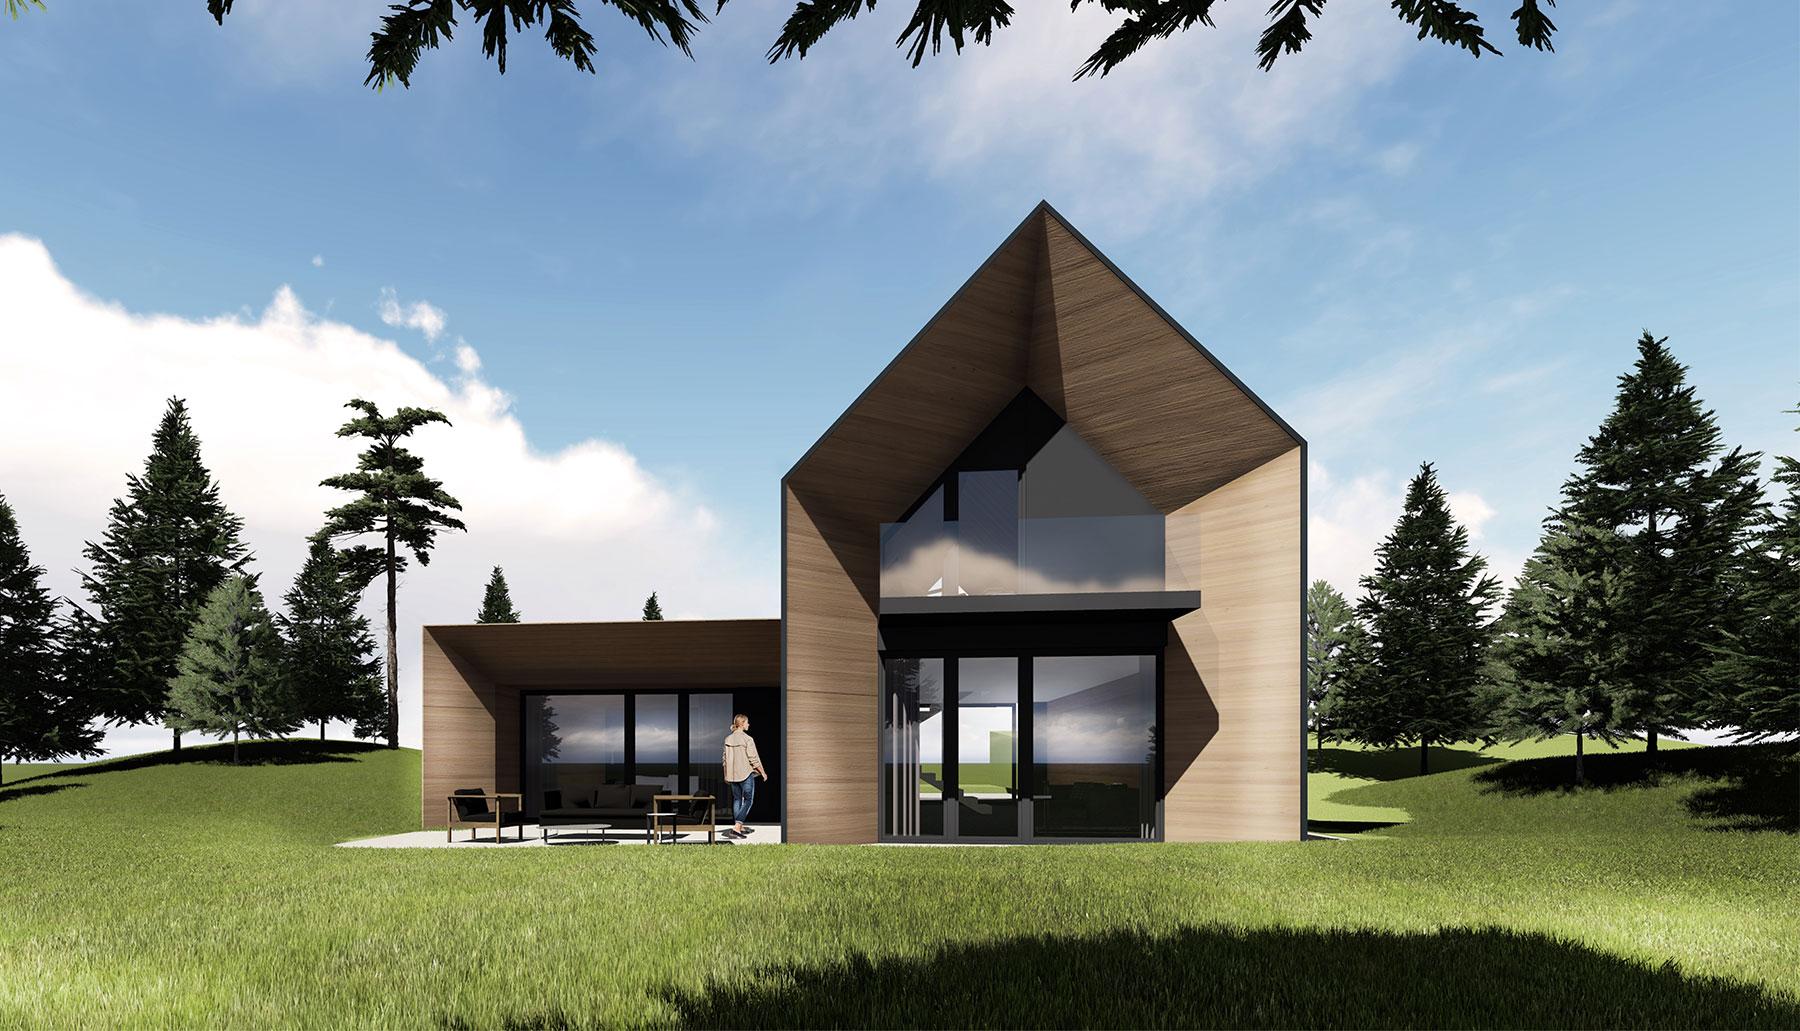 Architecte à Mulhouse : Serge Di Giusto, architecte DPLG